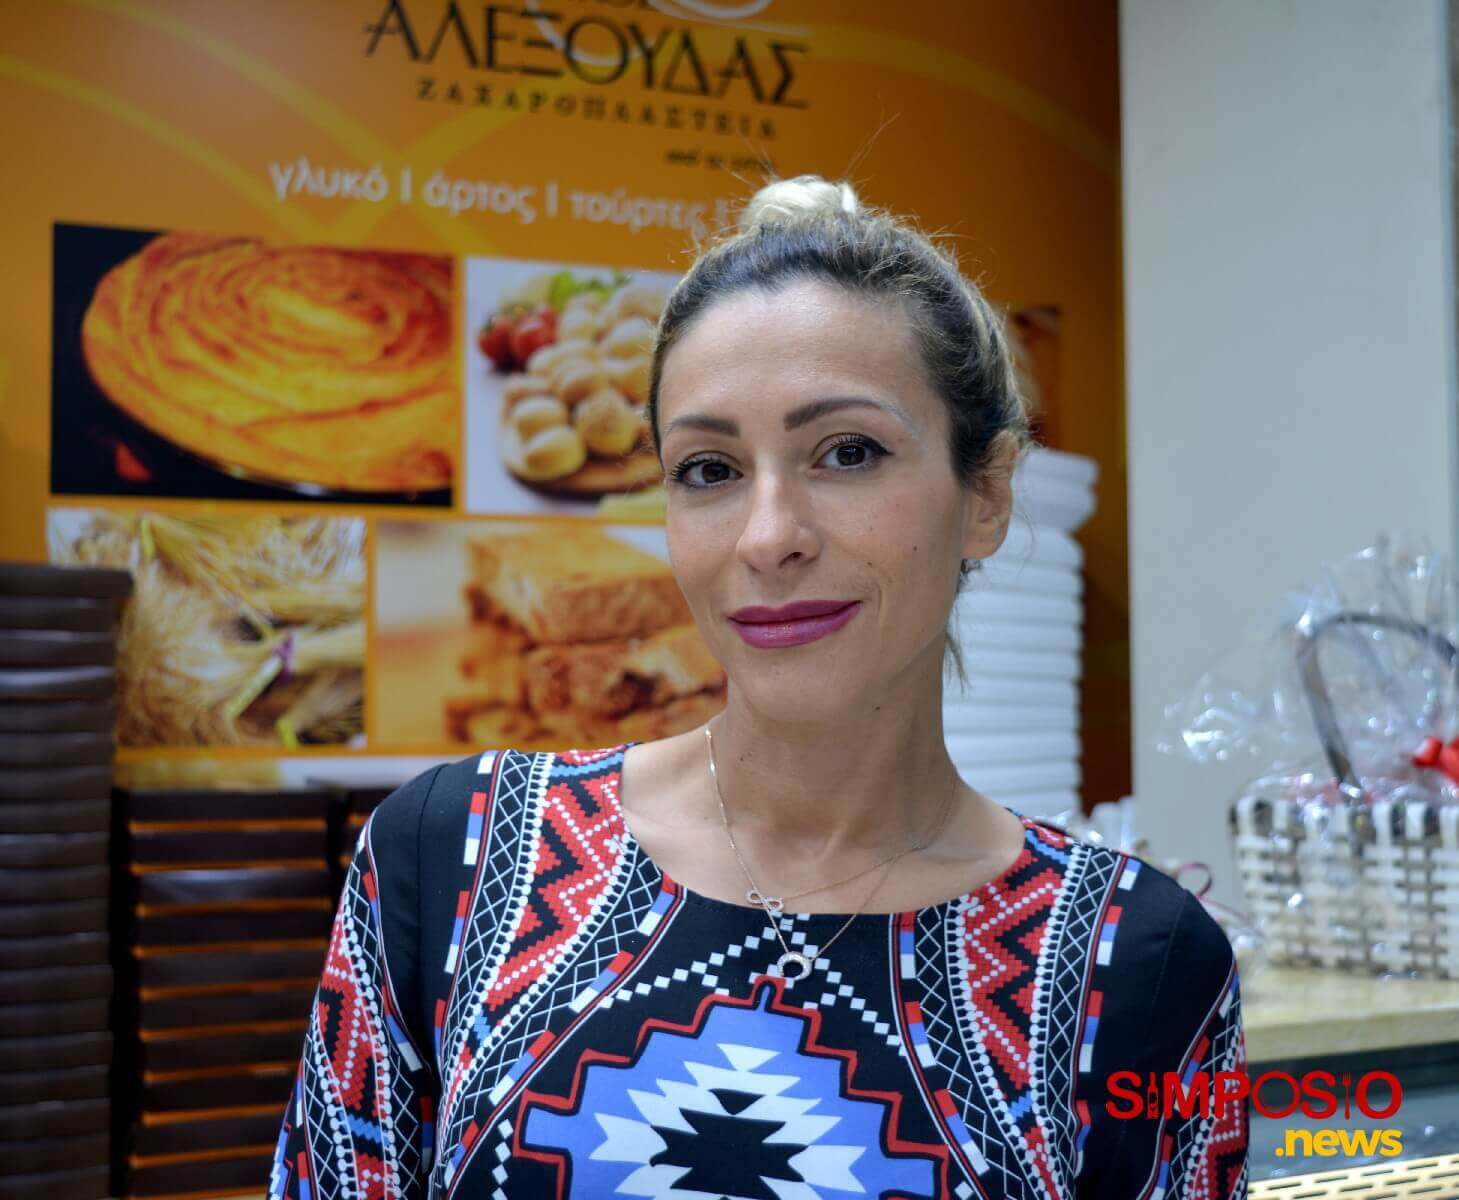 Alexouda-Kiki-Pastry